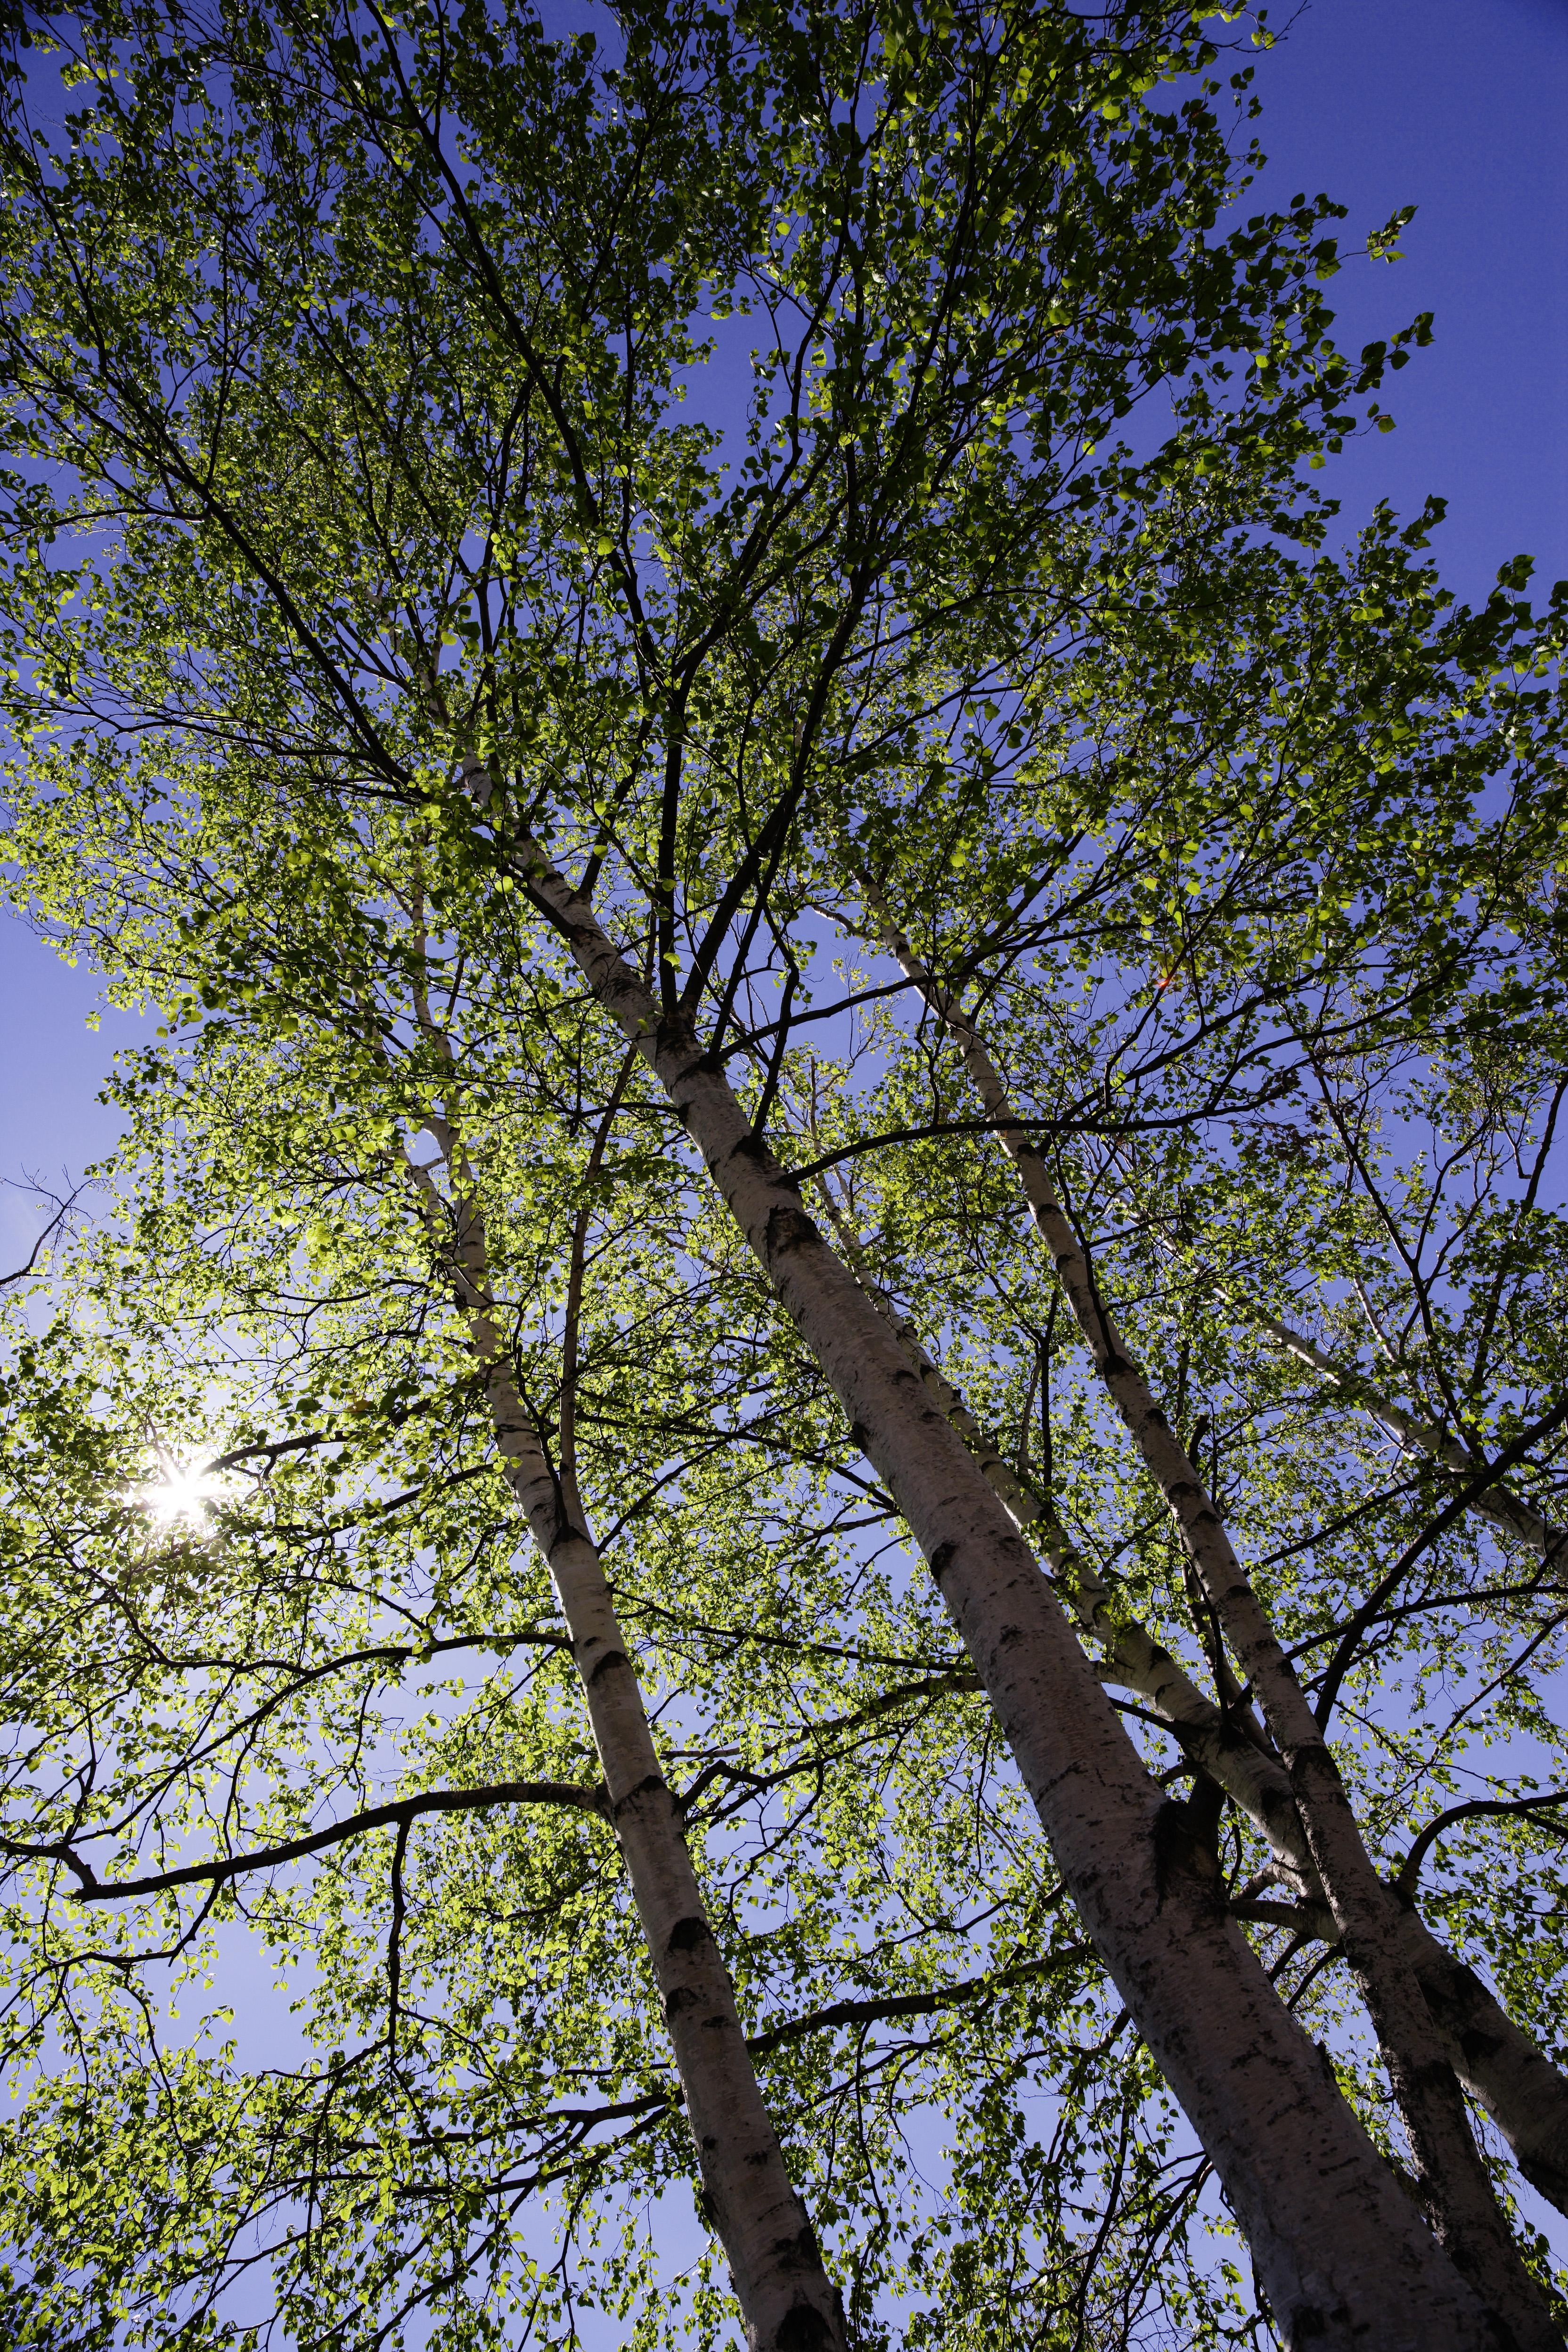 Yun gratis fotos no 2654 abedul blanco para un cielo azul jap n hokkaido - Abedul blanco ...